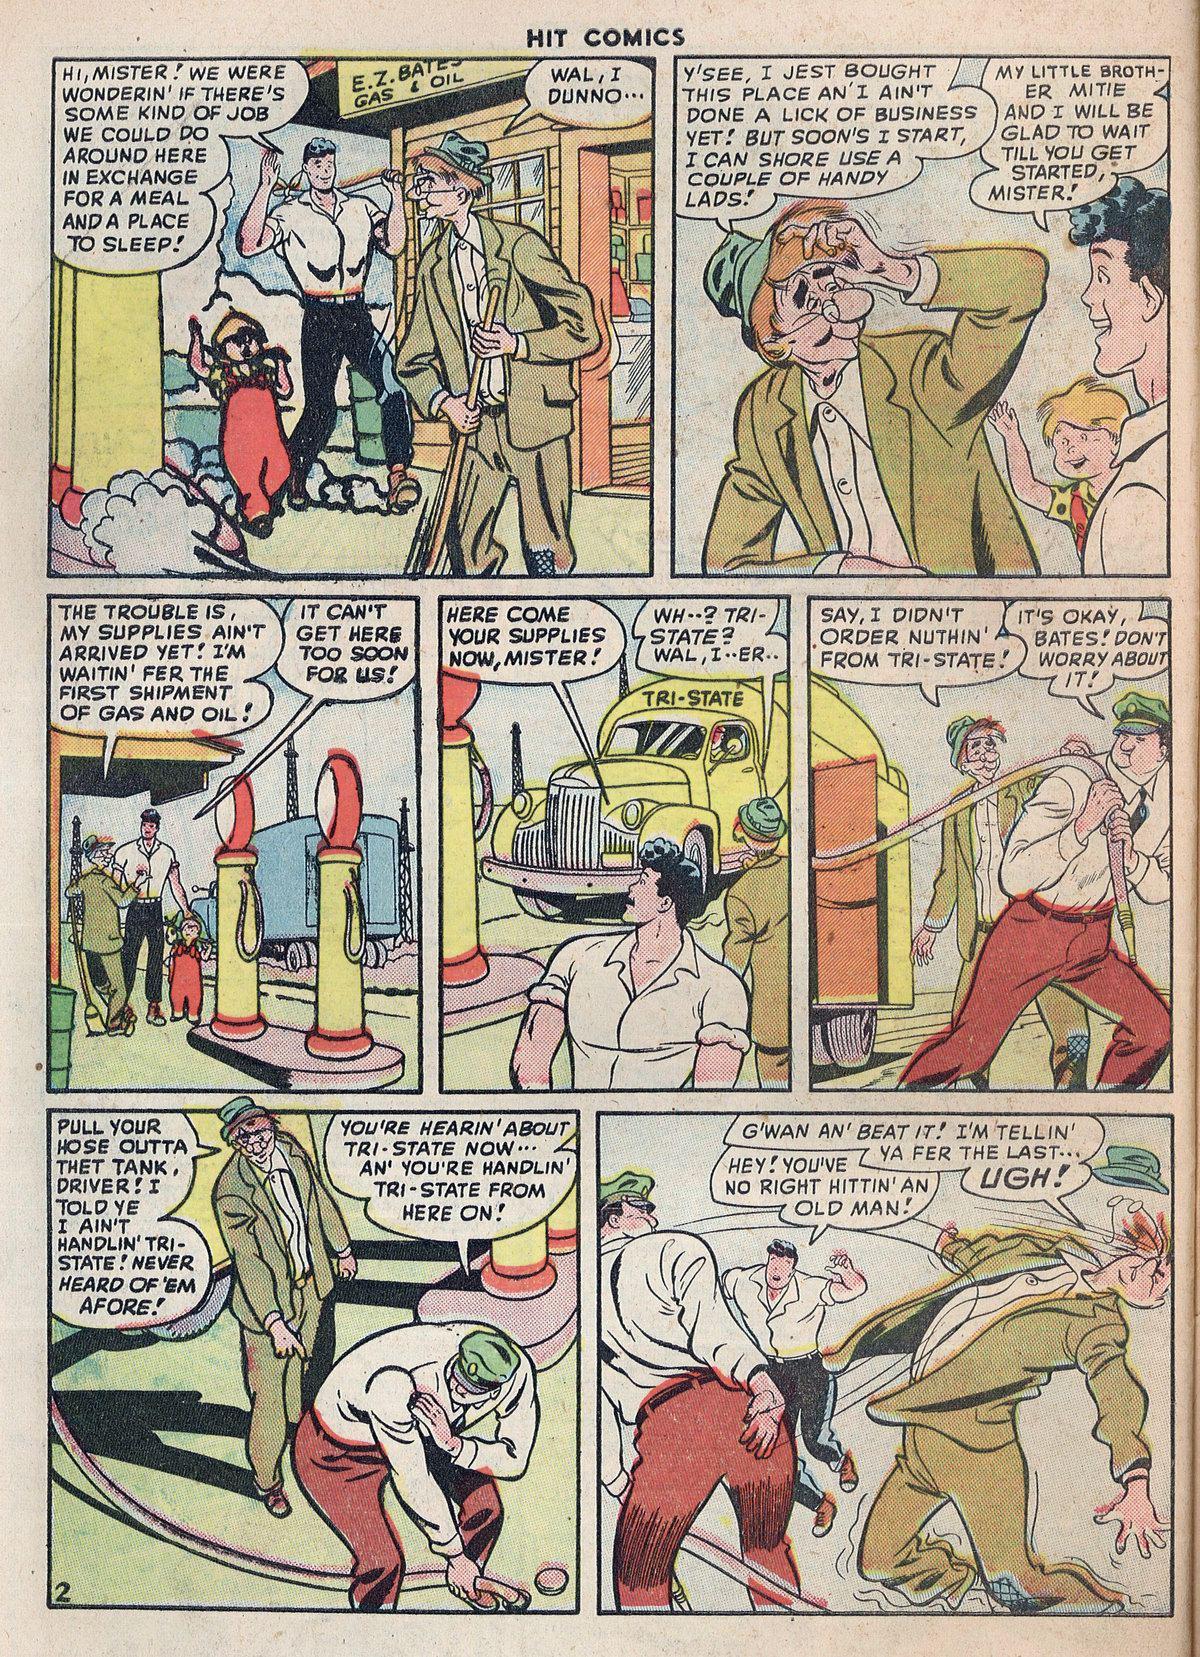 Read online Hit Comics comic -  Issue #55 - 46